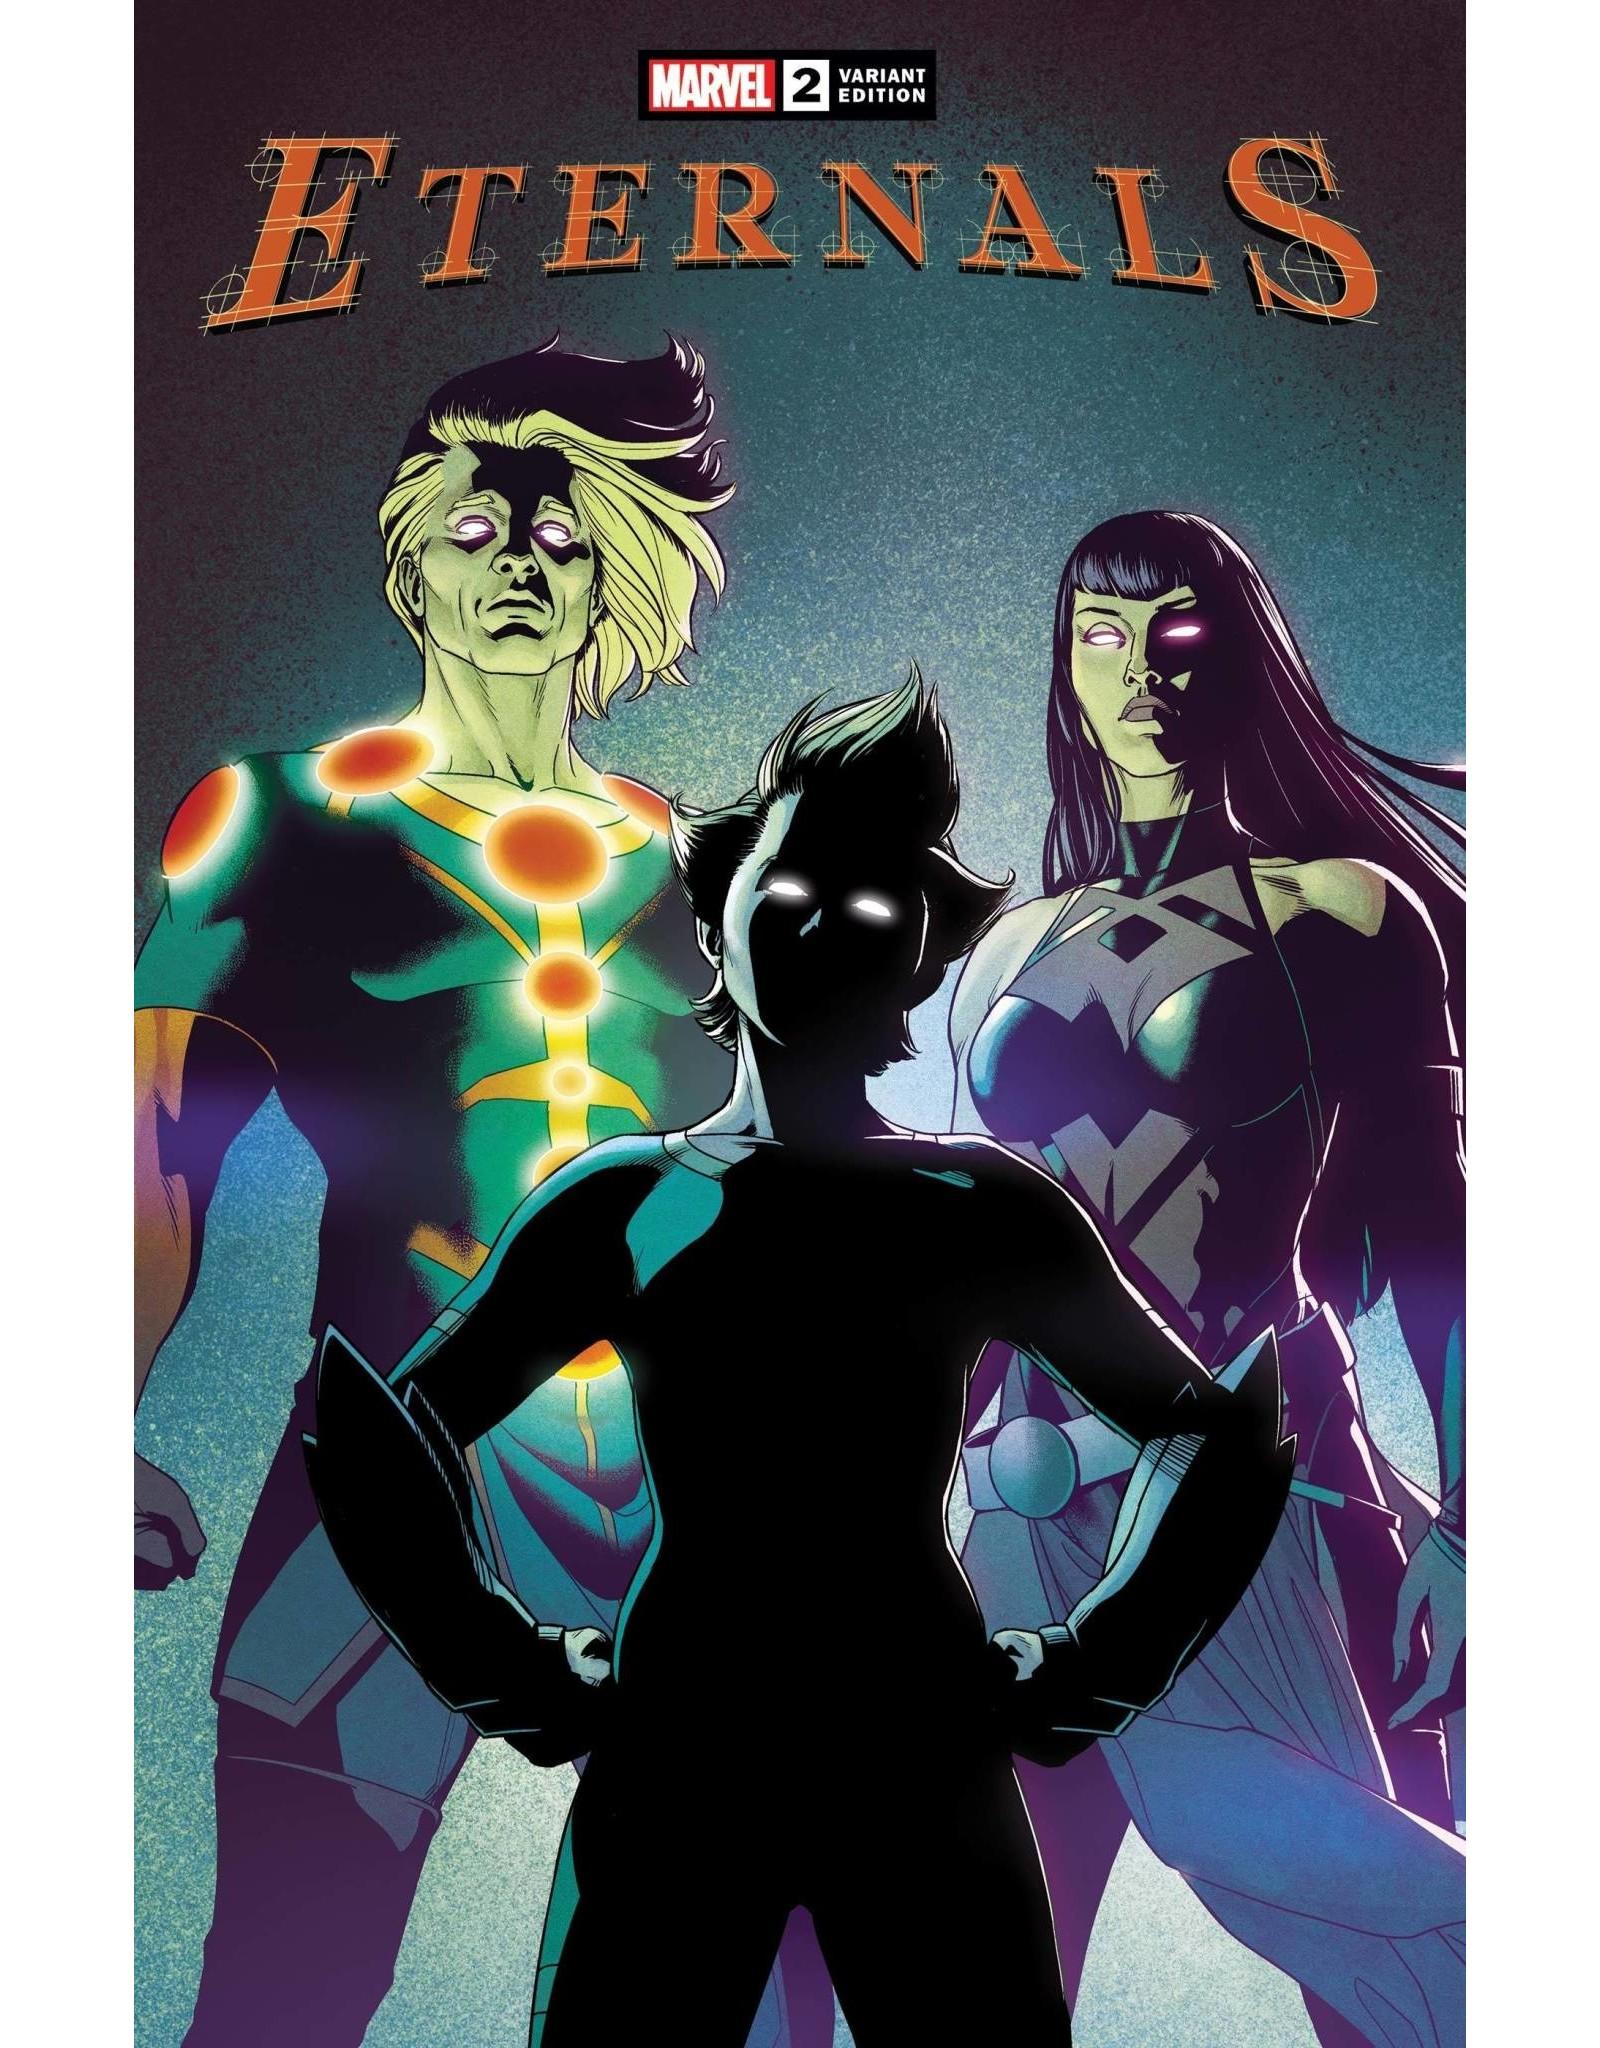 Marvel Comics ETERNALS #2 MCKELVIE VAR